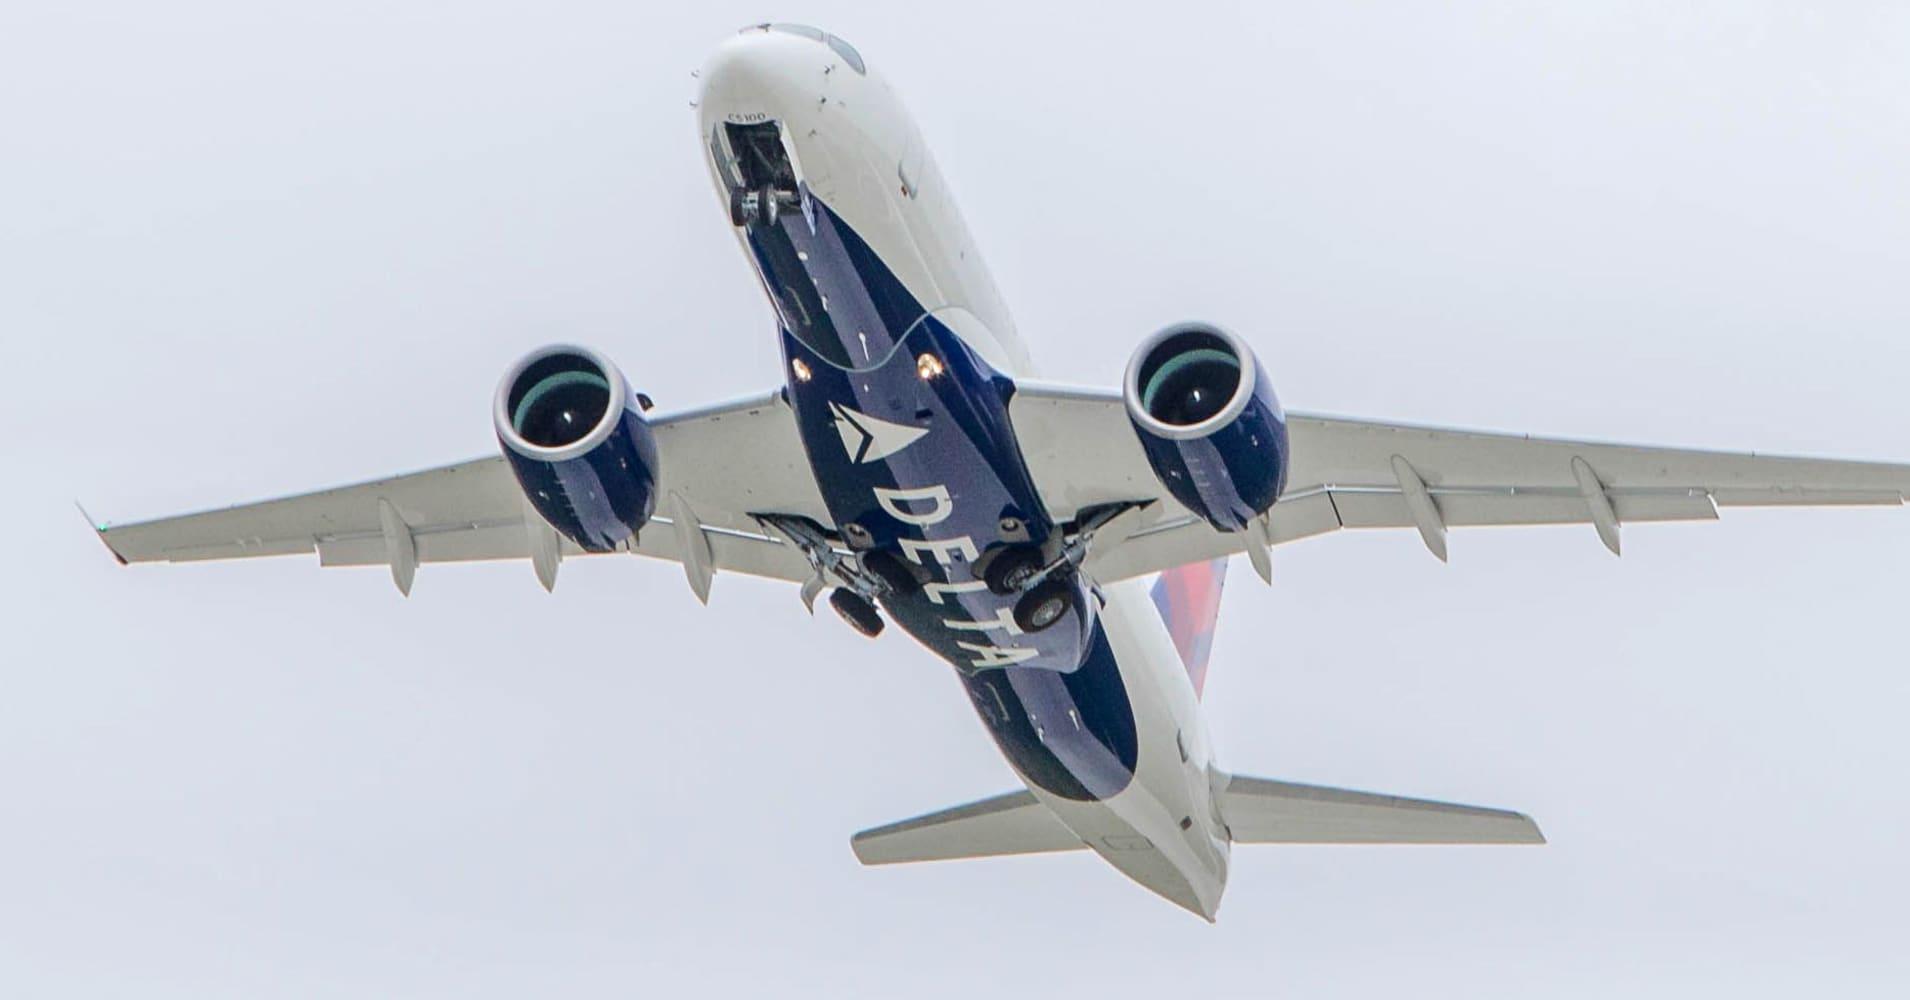 Government shutdown postpones debut of Delta's brand-new A220 jets, aviation geeks groan